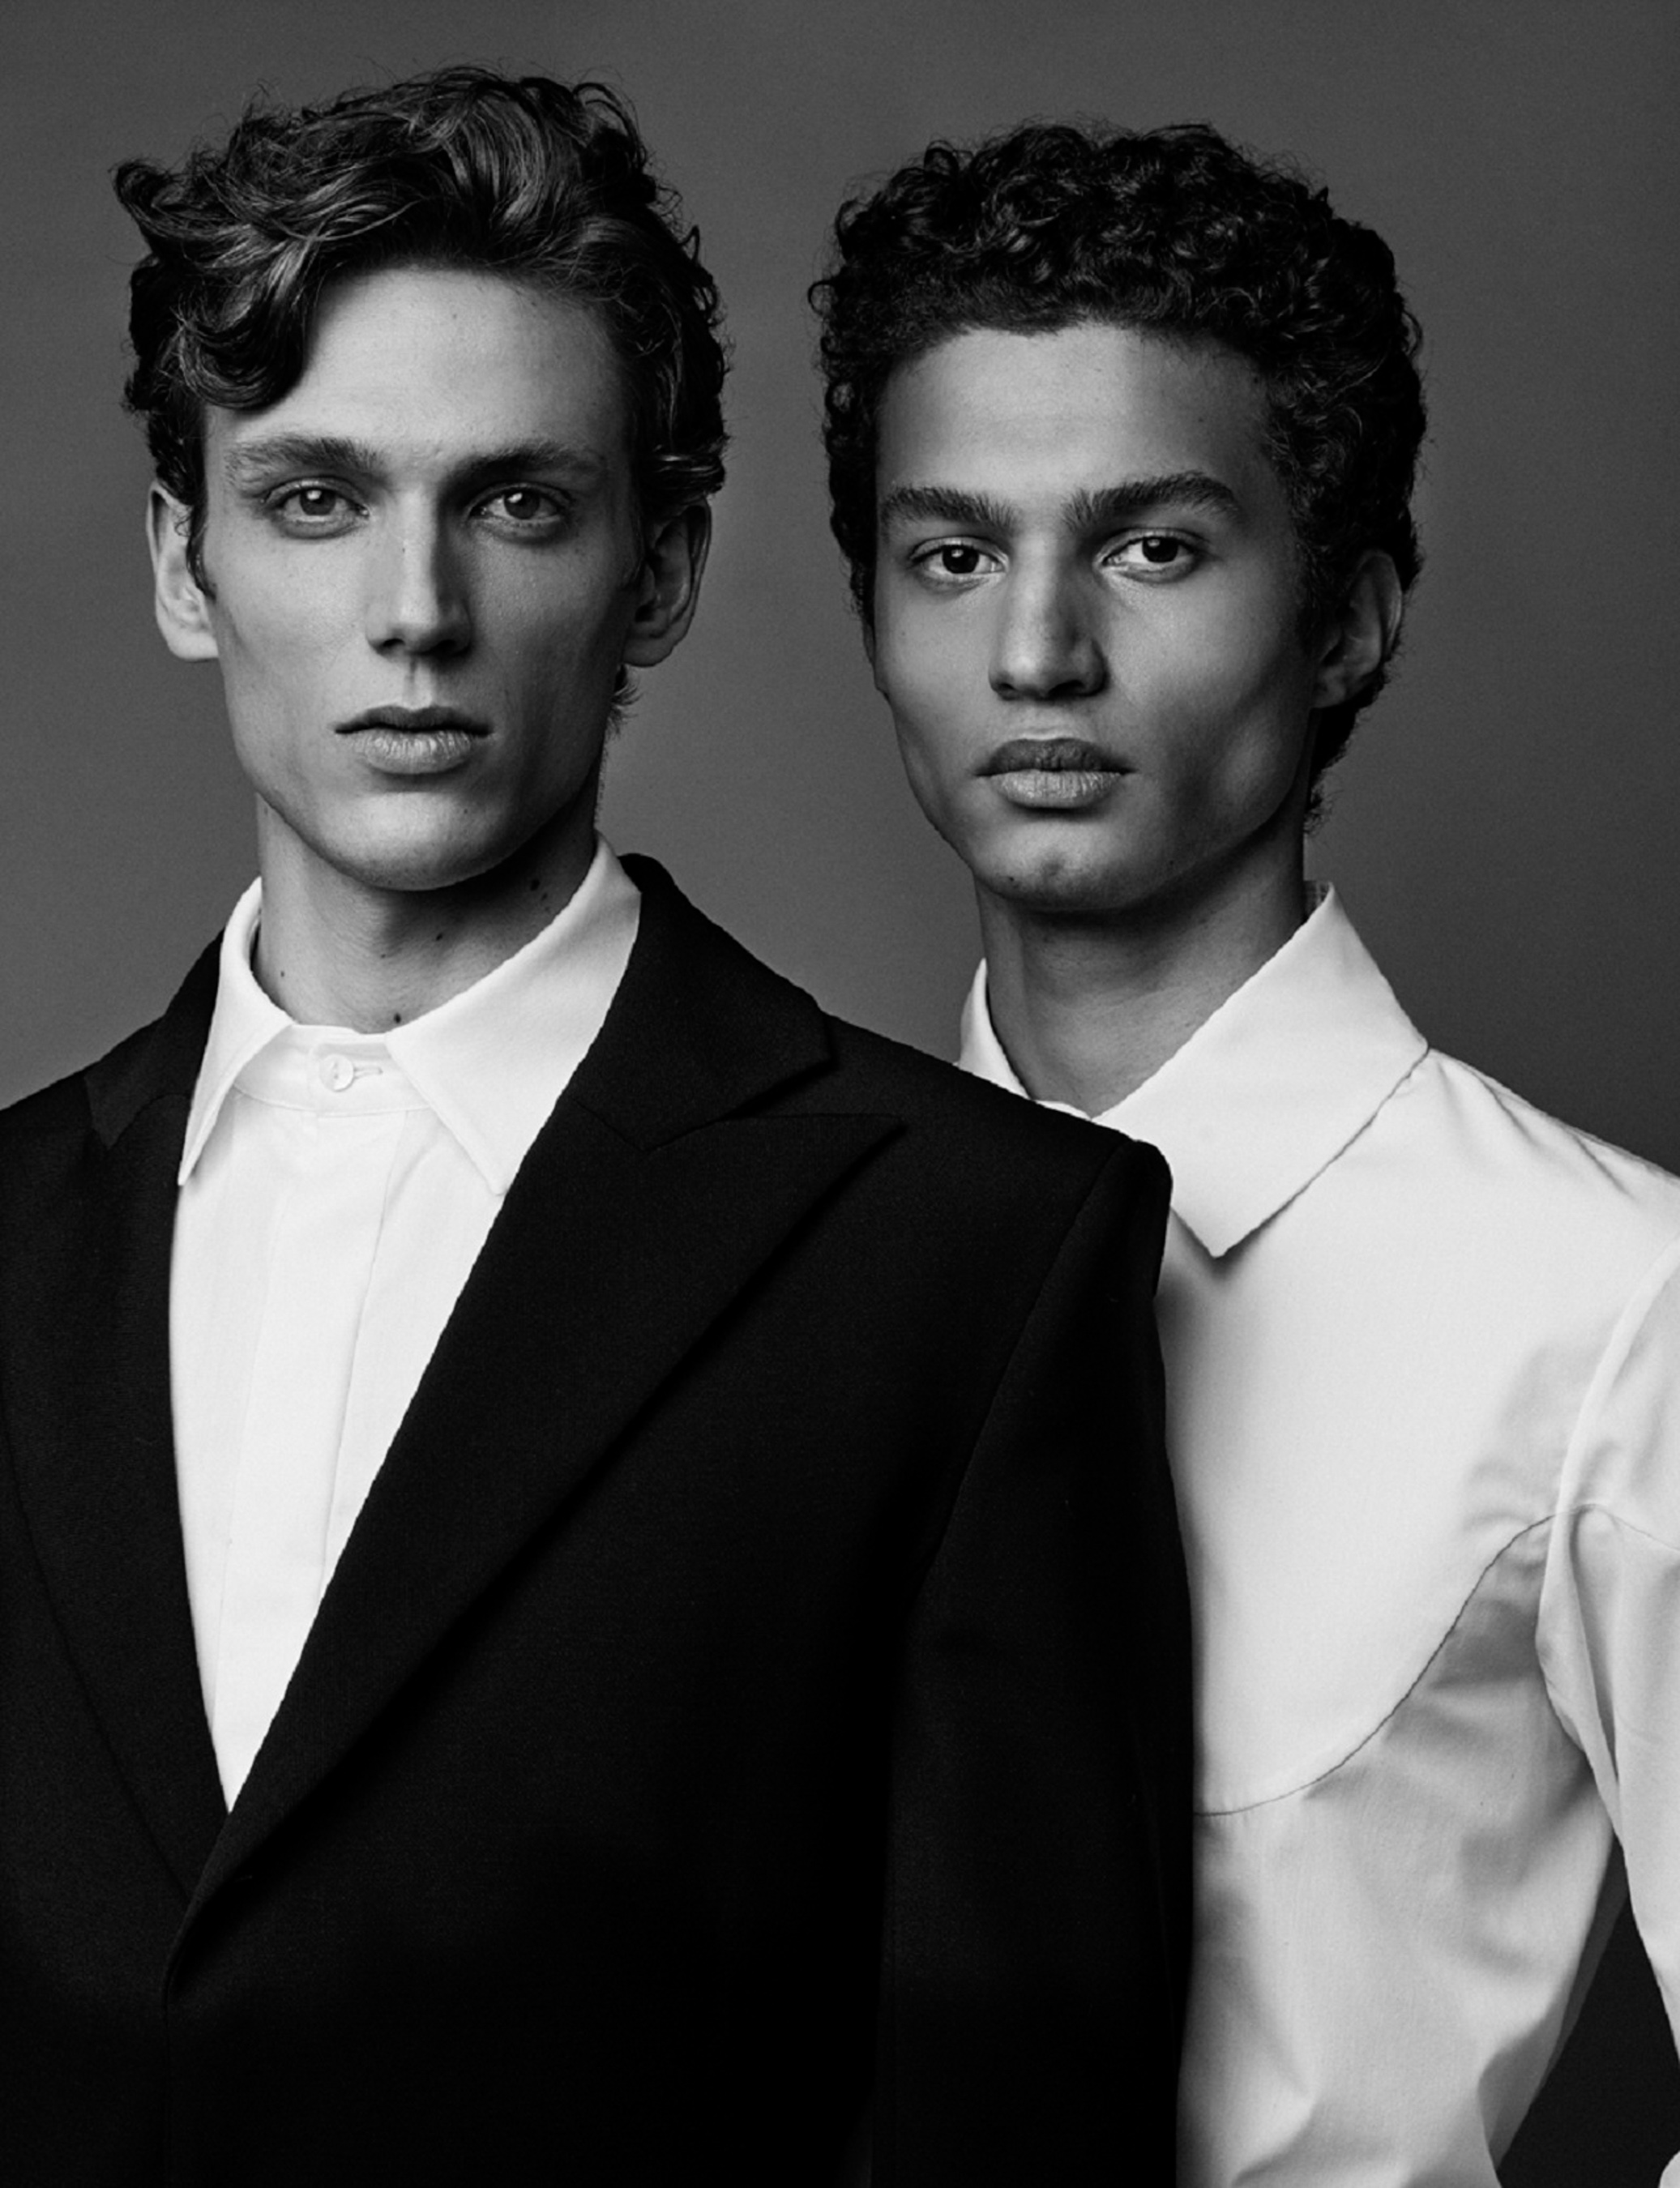 Kaushik Velendra Fall 2021 Men's Fashion Show